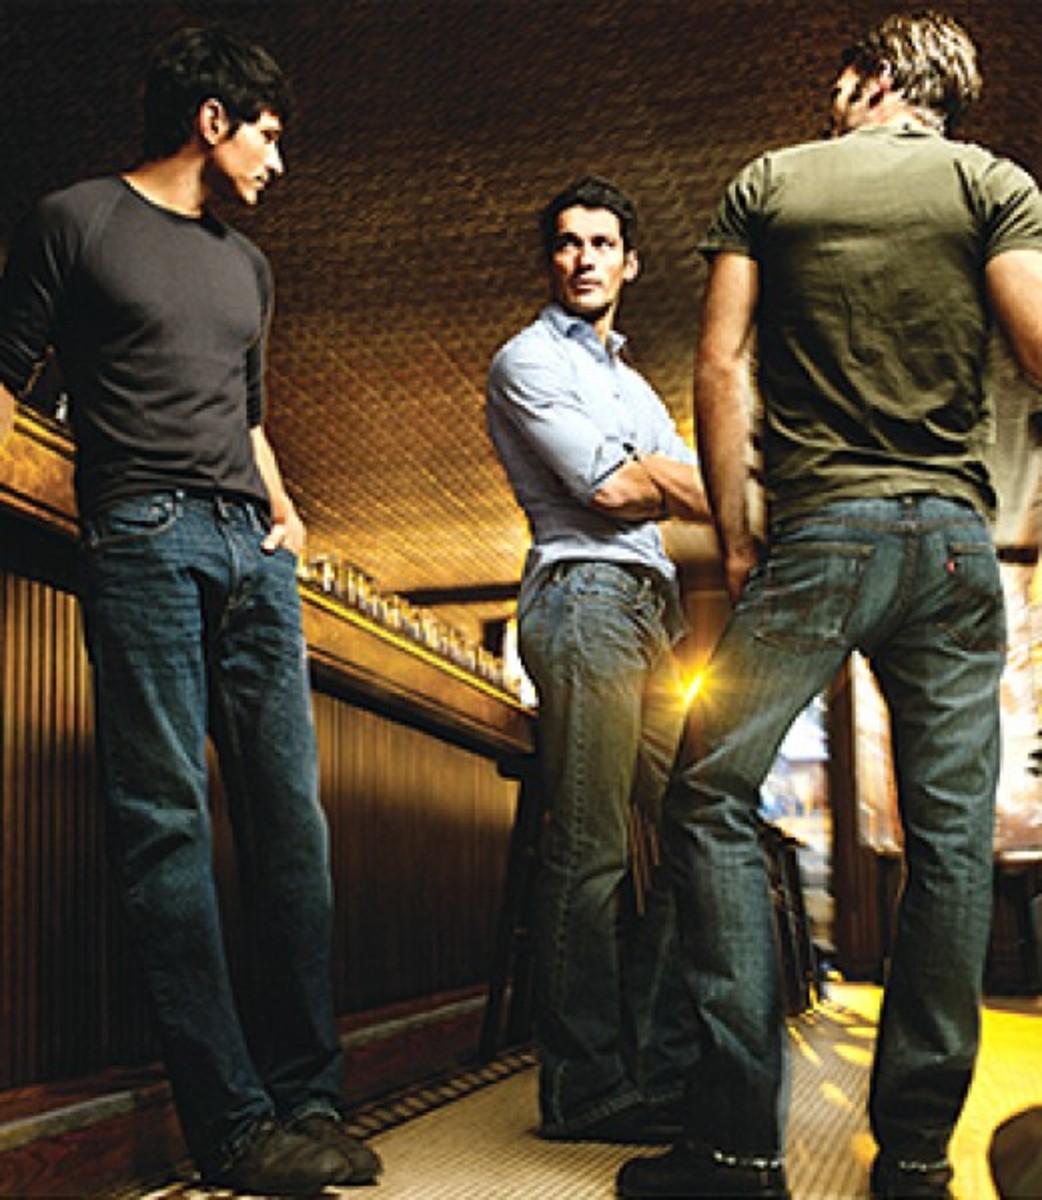 Levi jeans for men